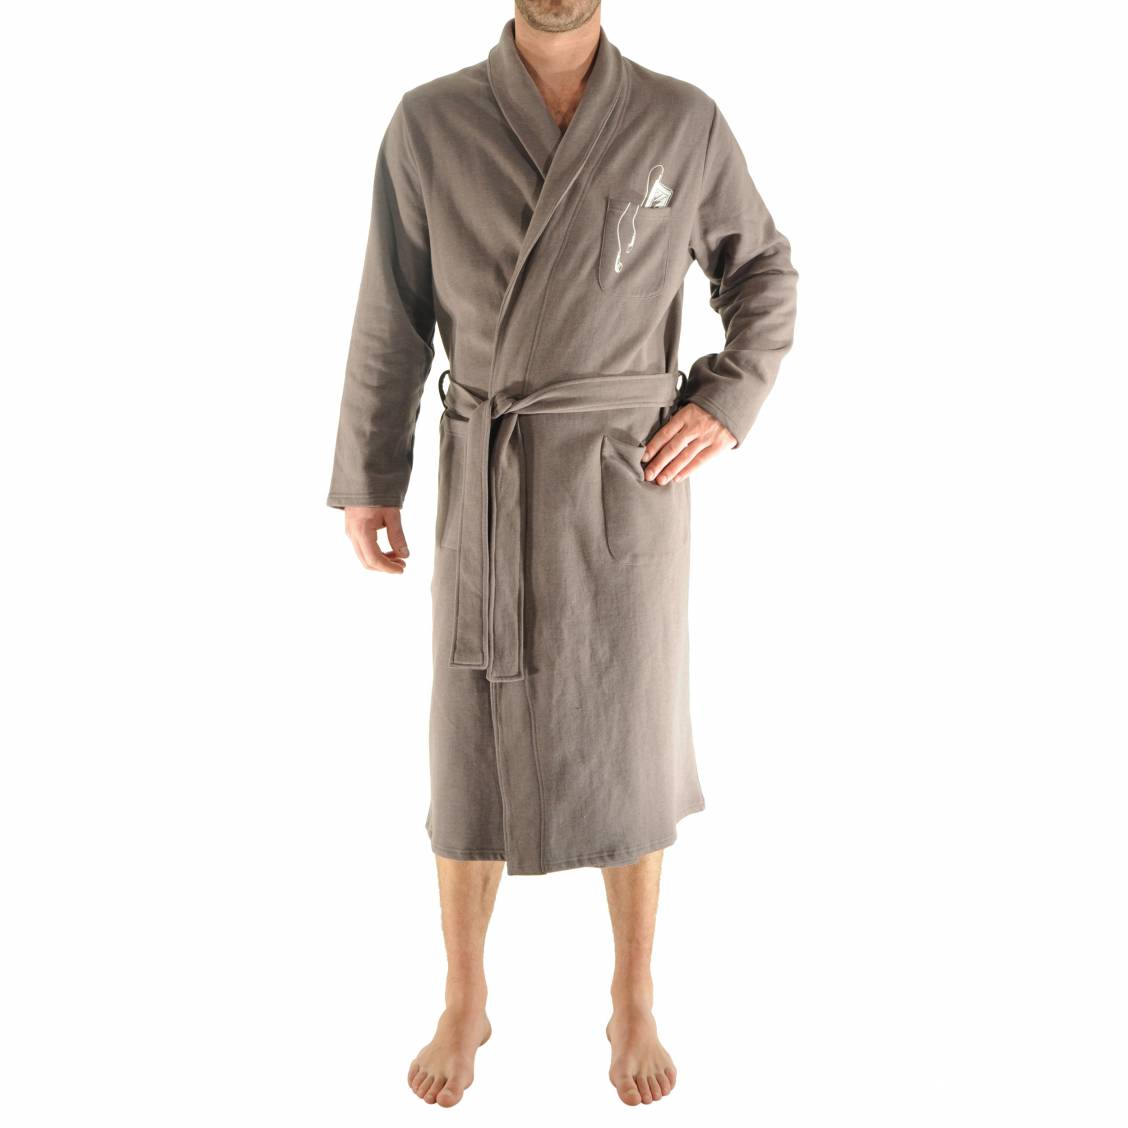 robe de chambre homme coton. Black Bedroom Furniture Sets. Home Design Ideas